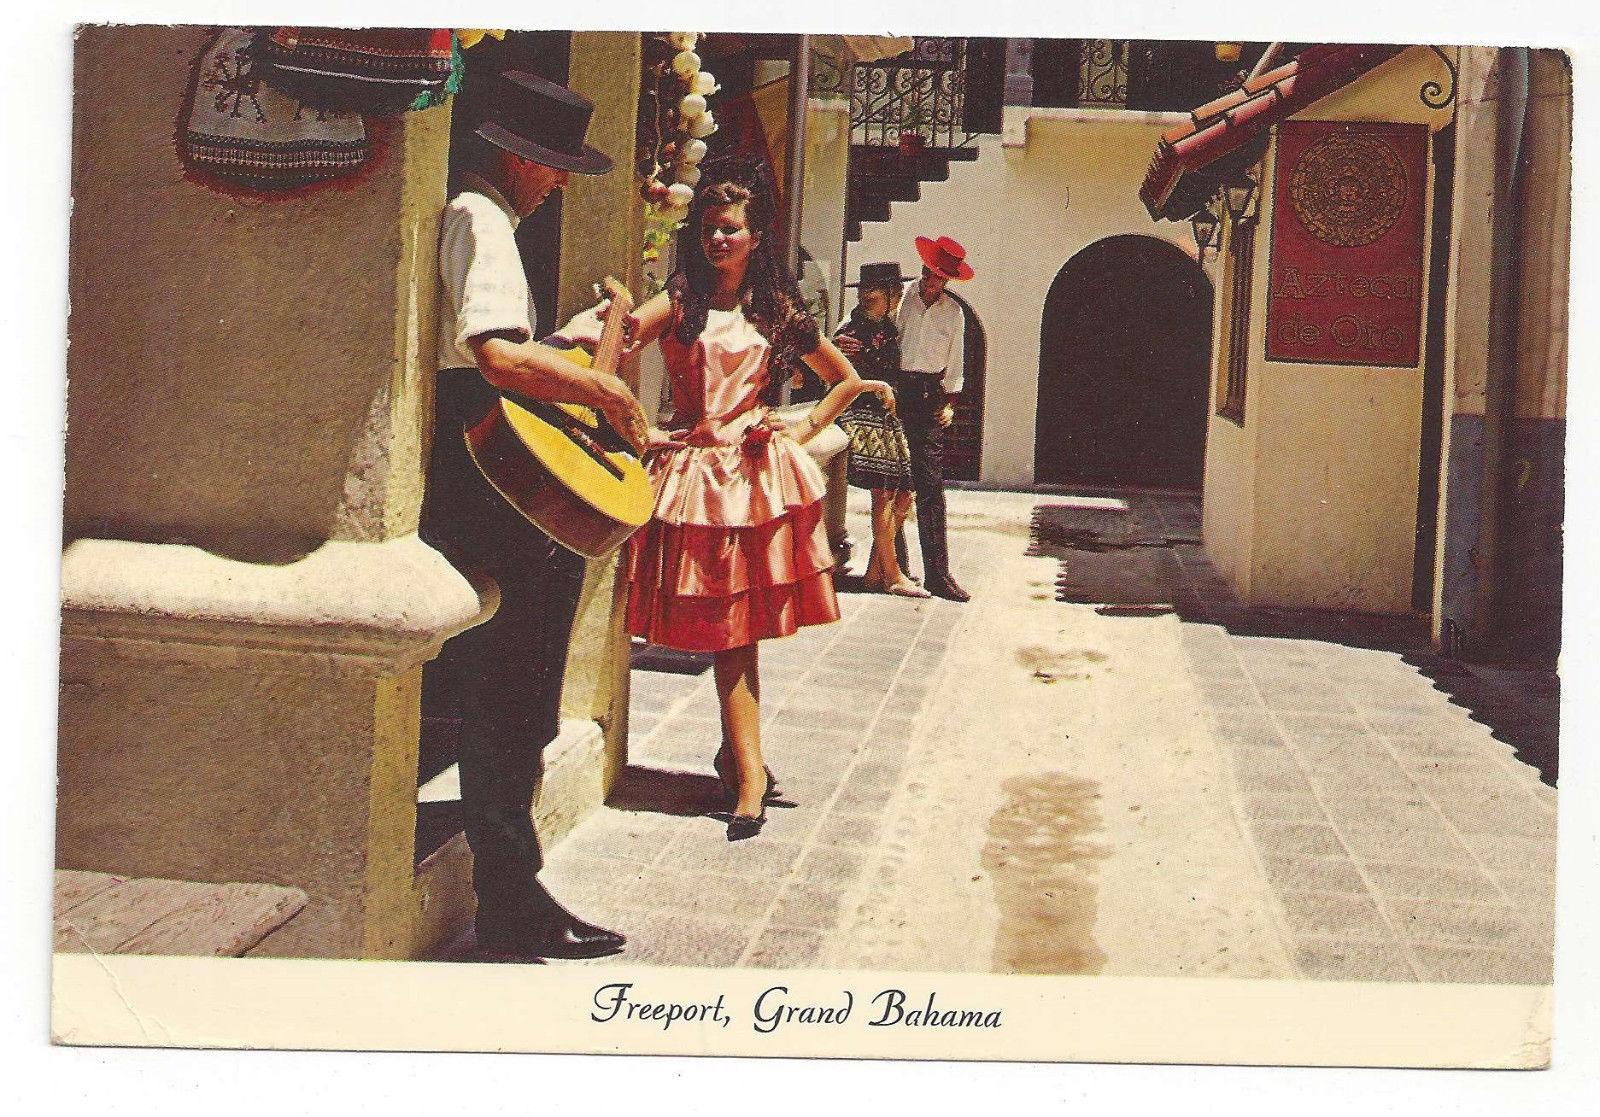 Caribbean Grand Bahama Freeport Spanish Street Bazaar Vtg 1969 Postcard 4X6